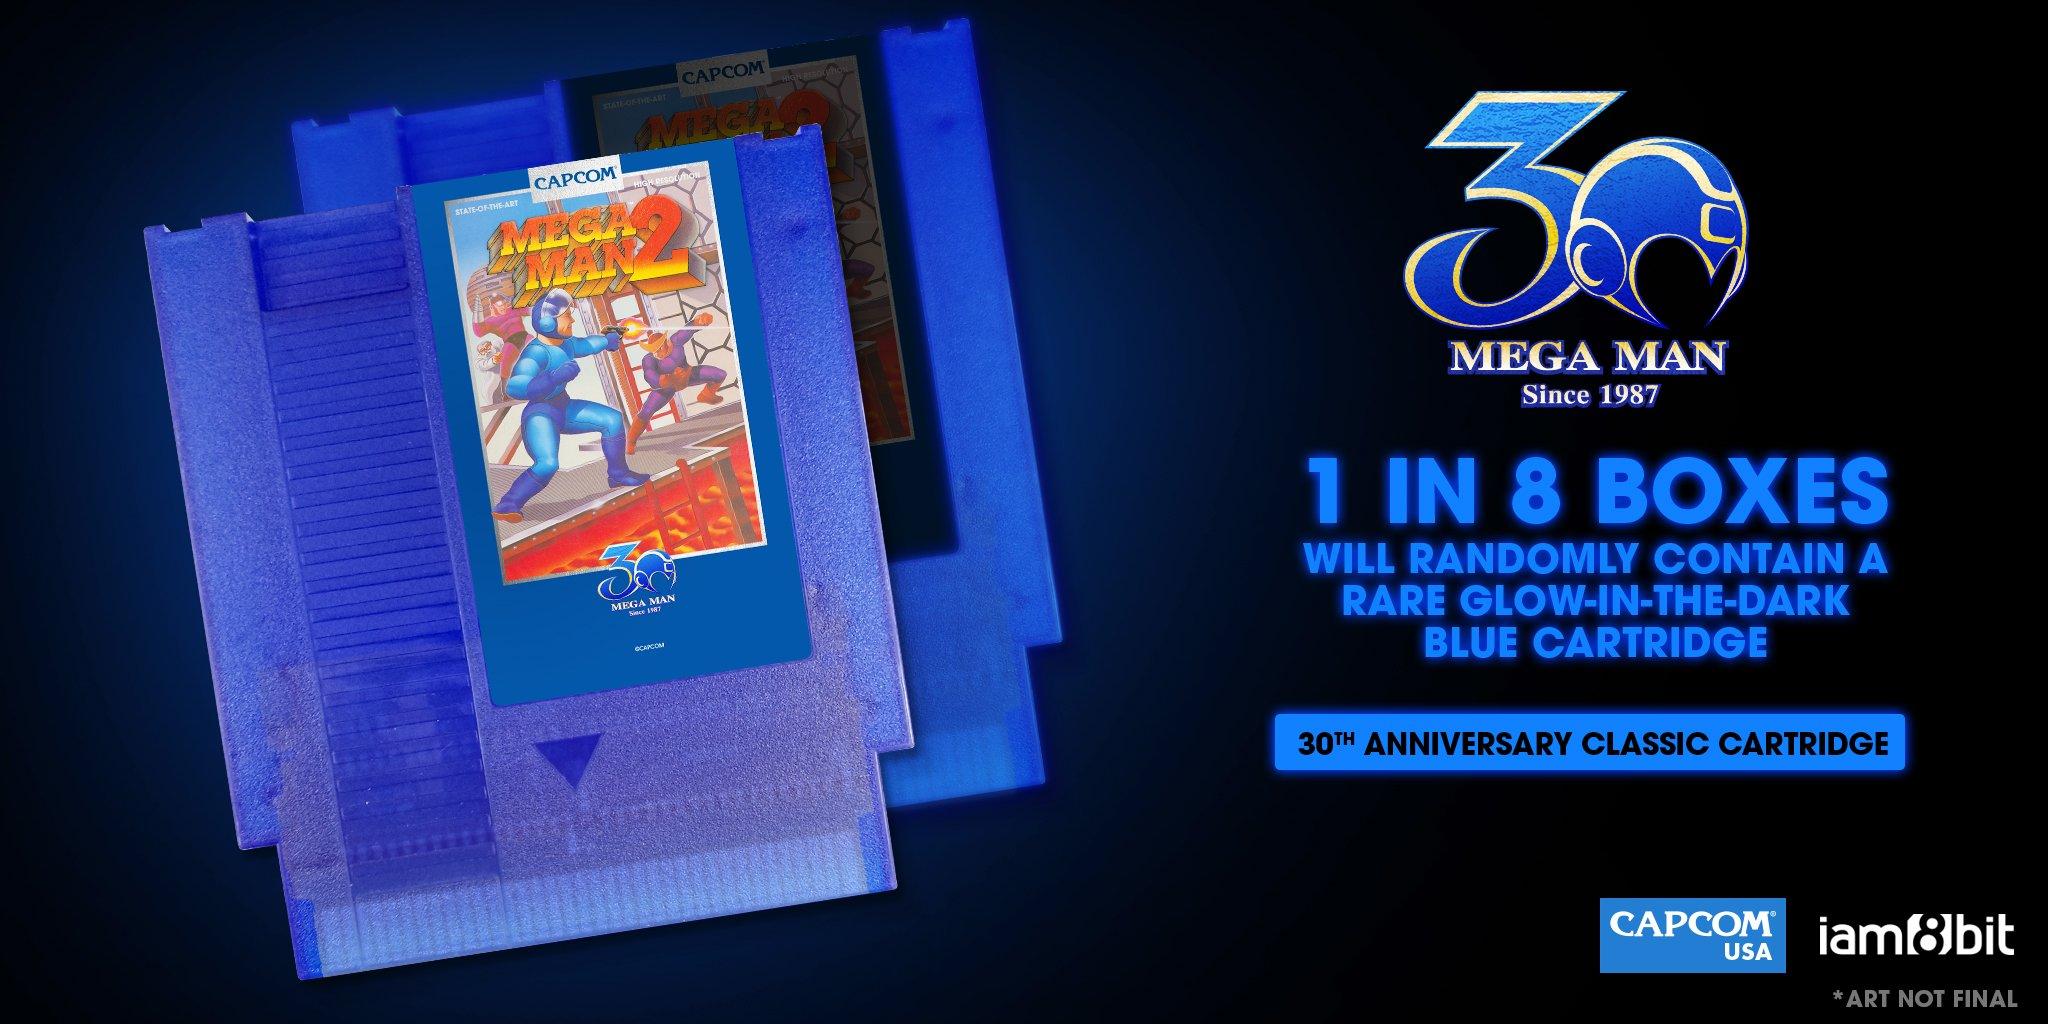 04-Mega_Man_2-30th_Anniversary_Classic_Cartridge.JPG